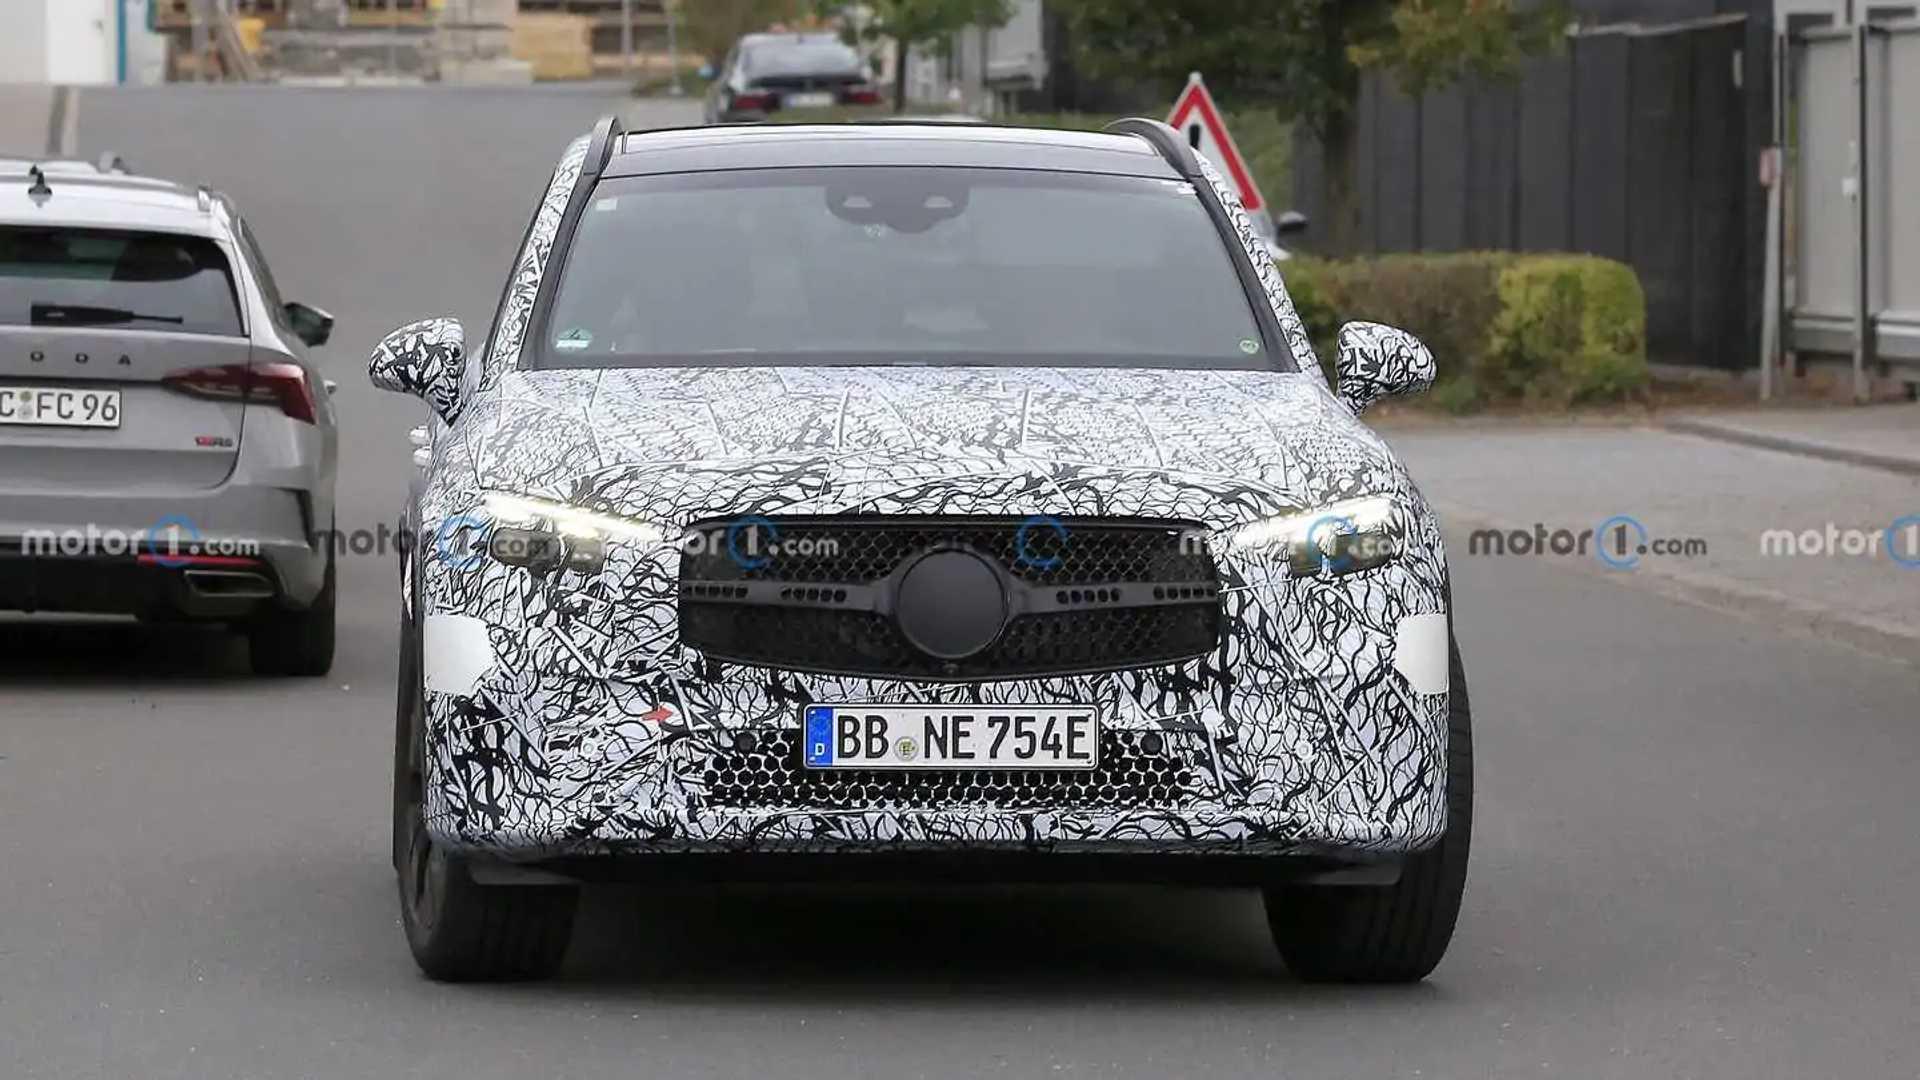 2023 Mercedes GLC spied with rear-wheel steering